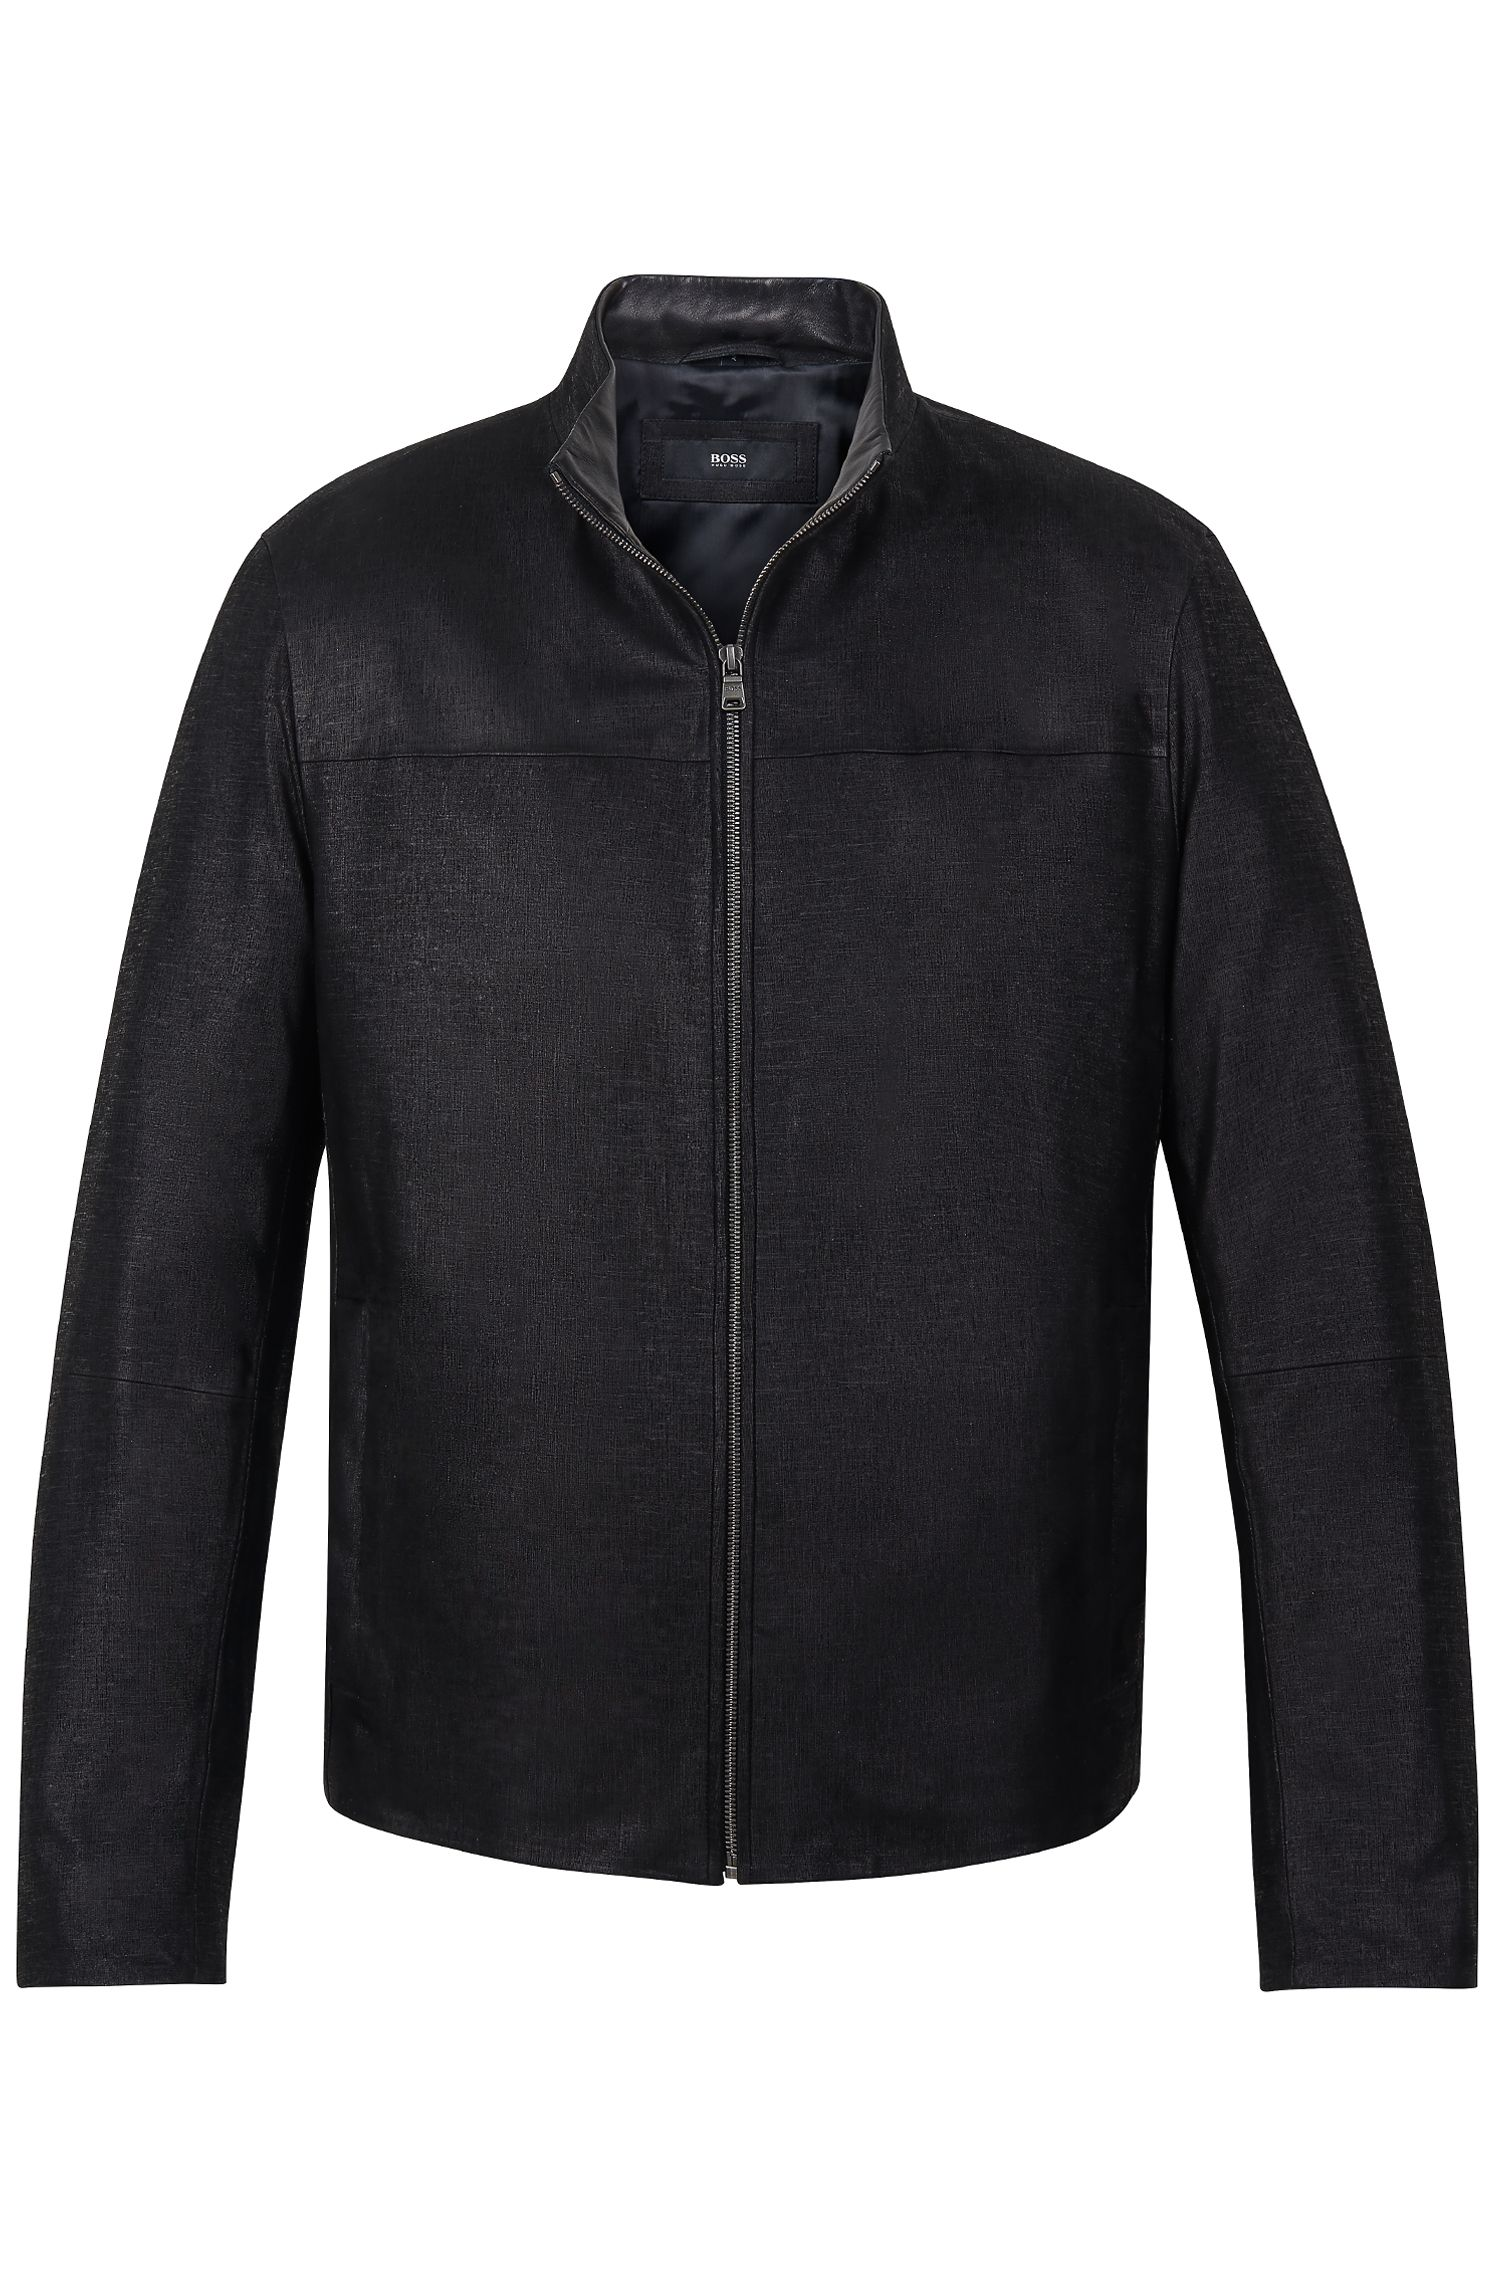 'Dalmin' | Sheepskin Leather Printed Jacket